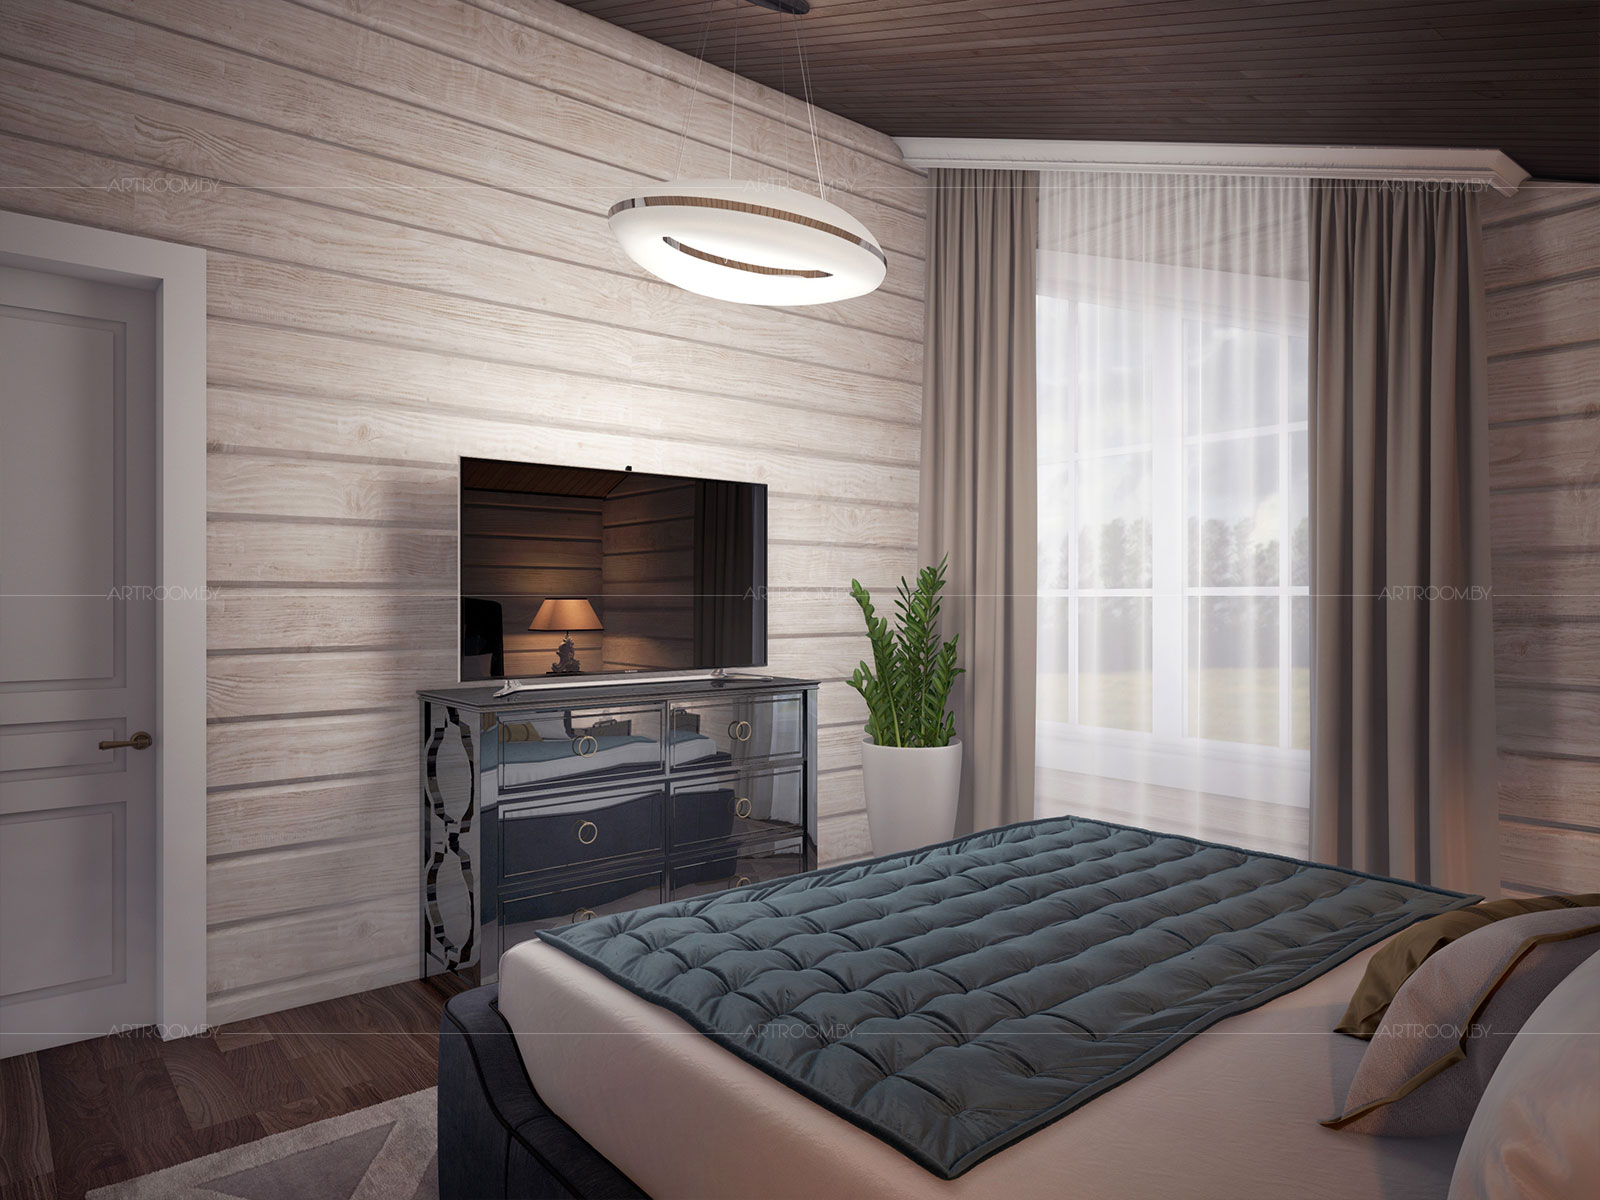 комнаты из имитации бруса фото домкраты